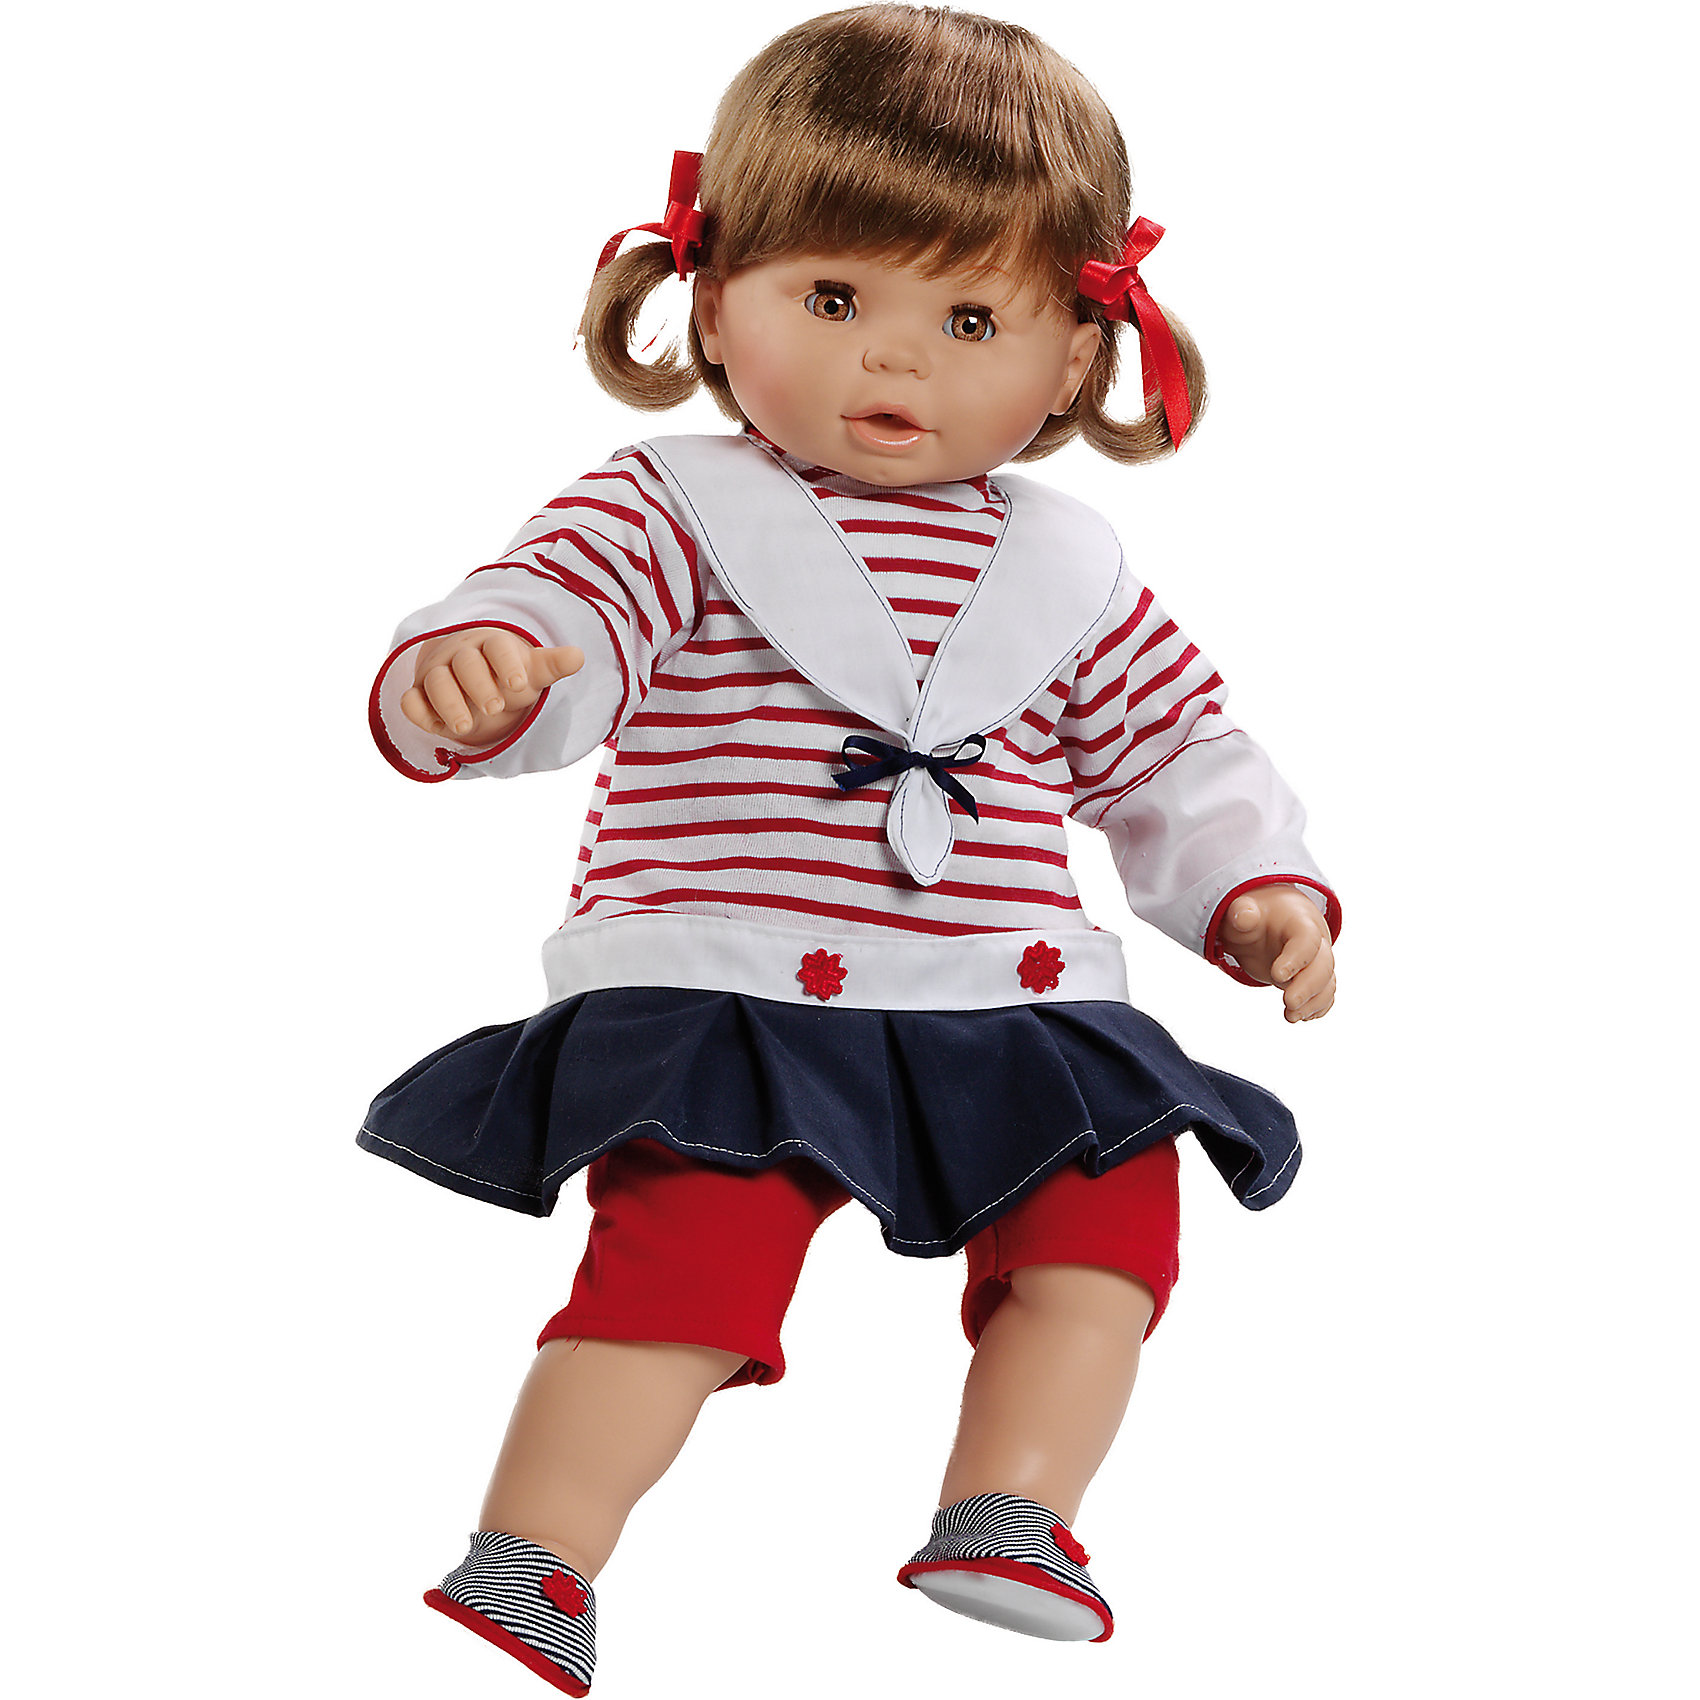 Paola Reina Кукла Лаура, 60 см, Paola Reina кукла пупс без одежды 22см 31014 paola reina